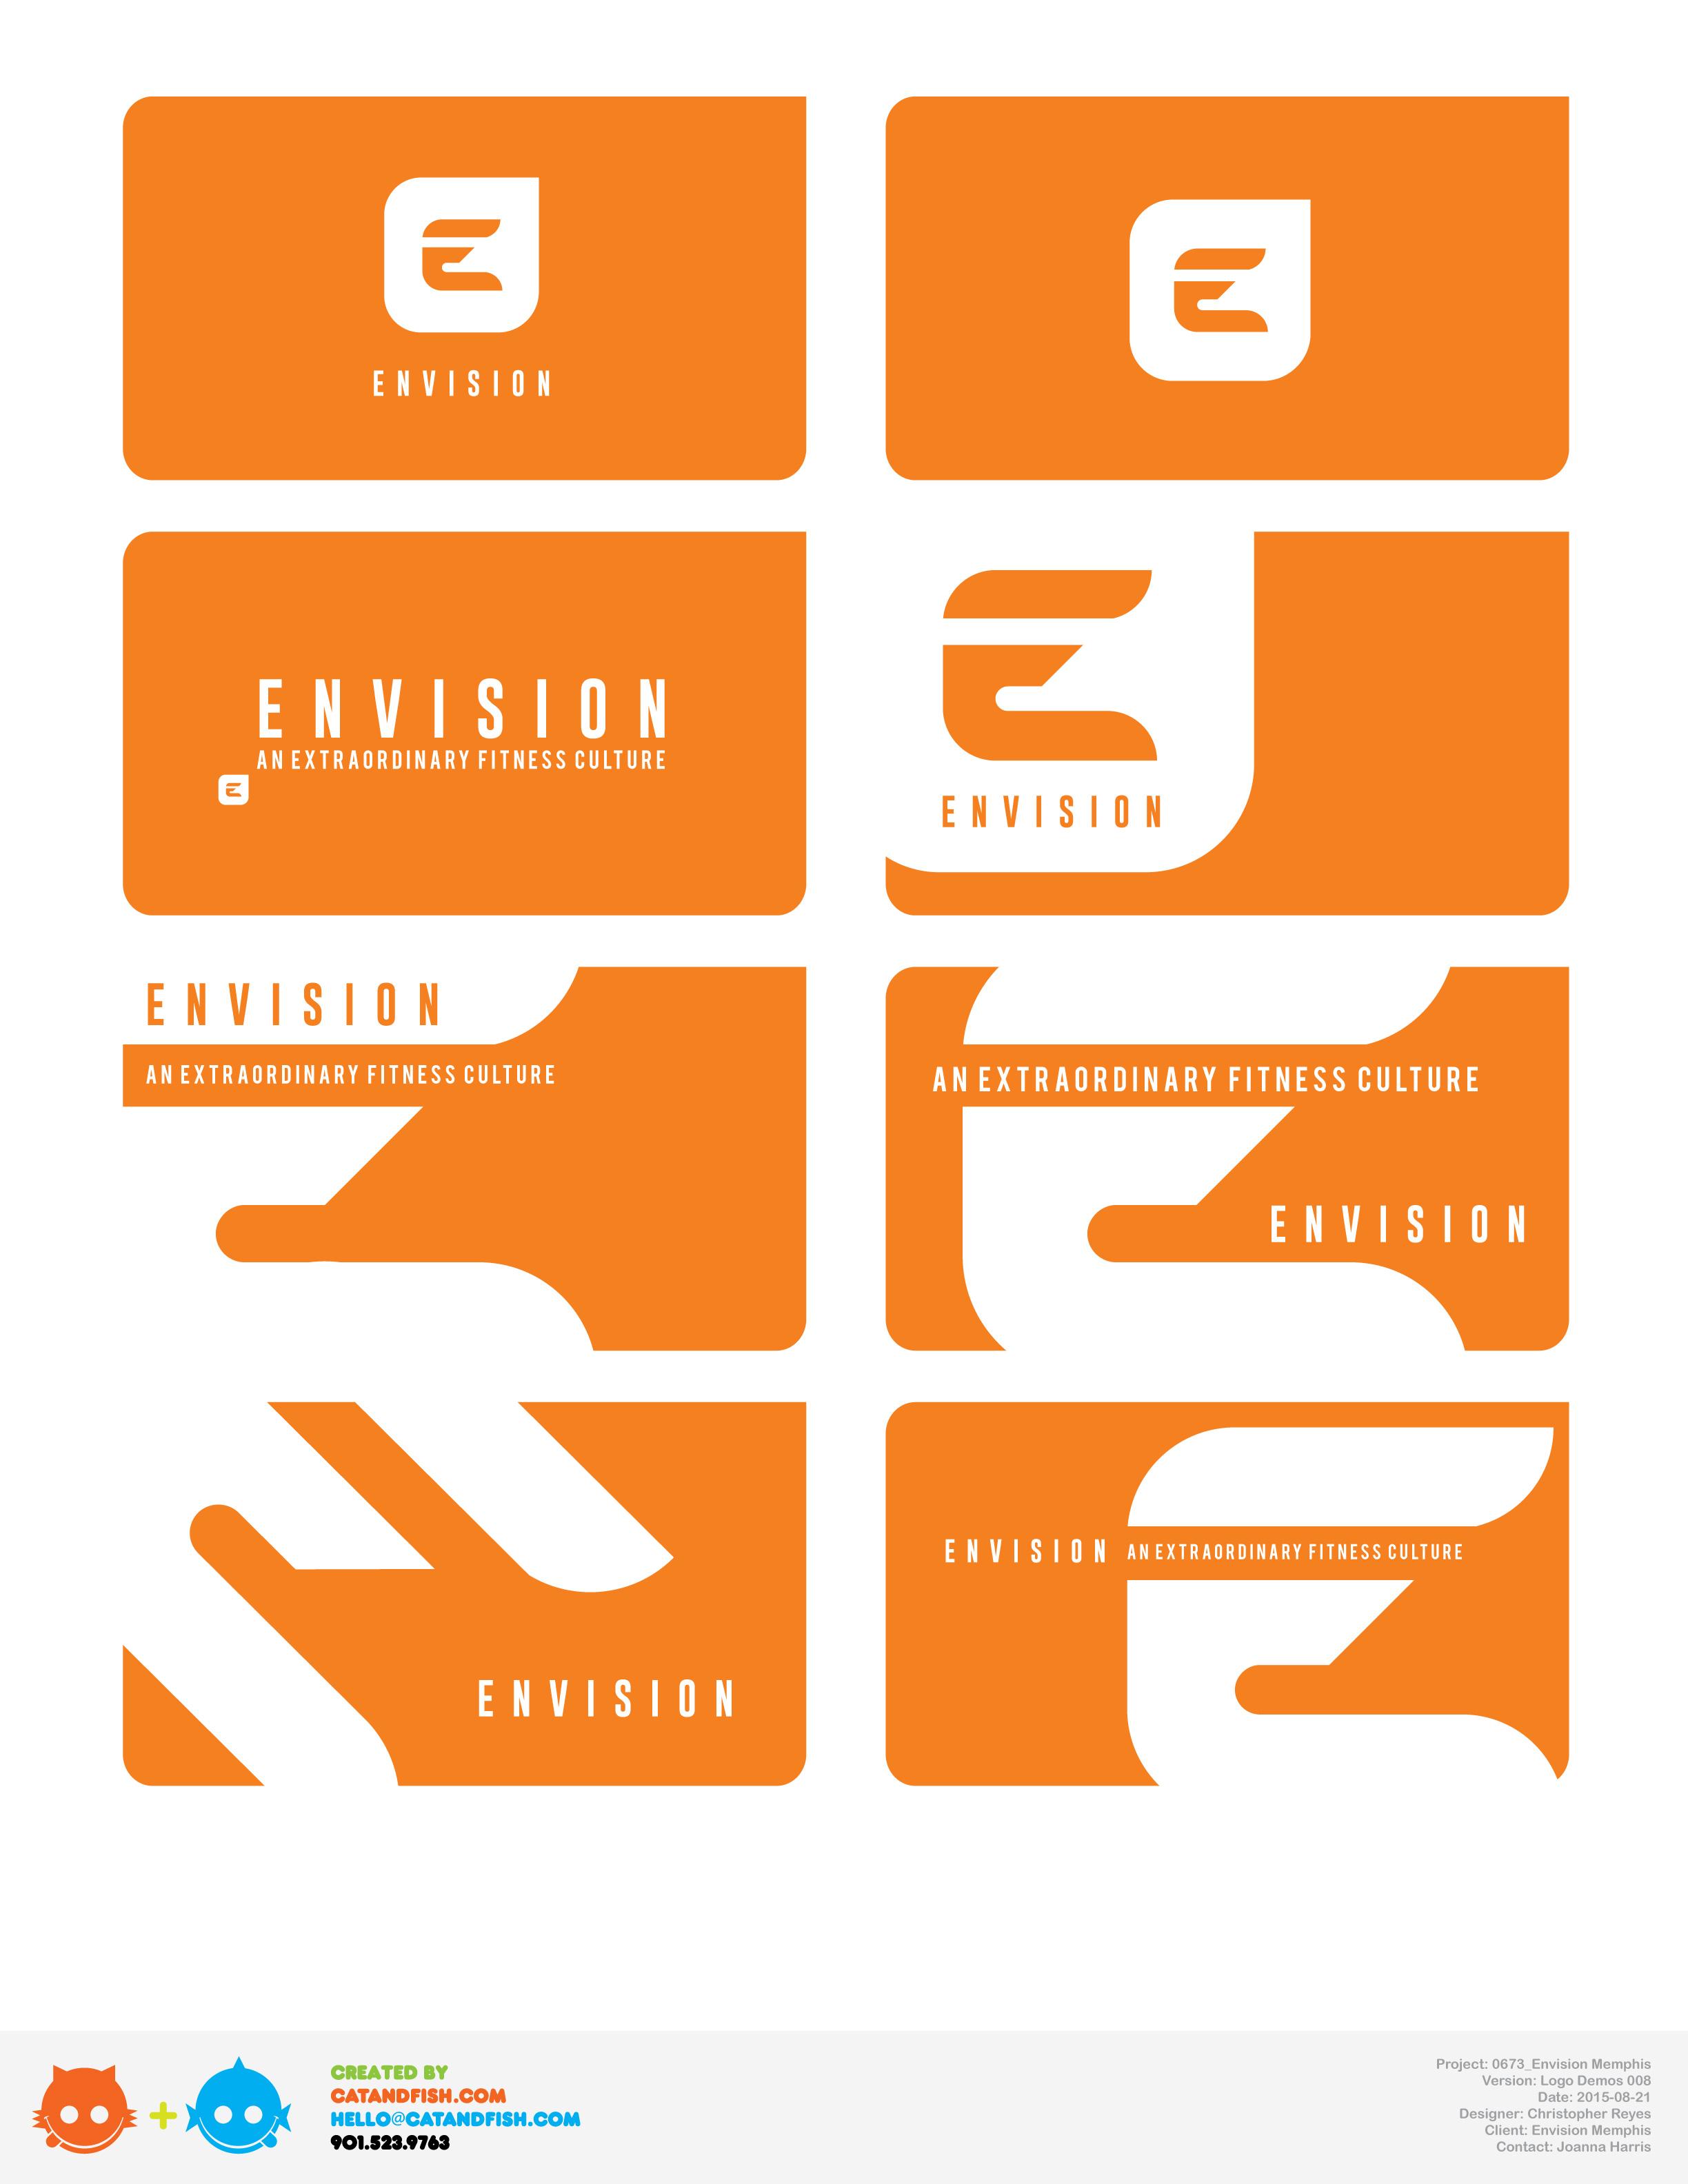 Envision-Memphis---Business-cards.jpg